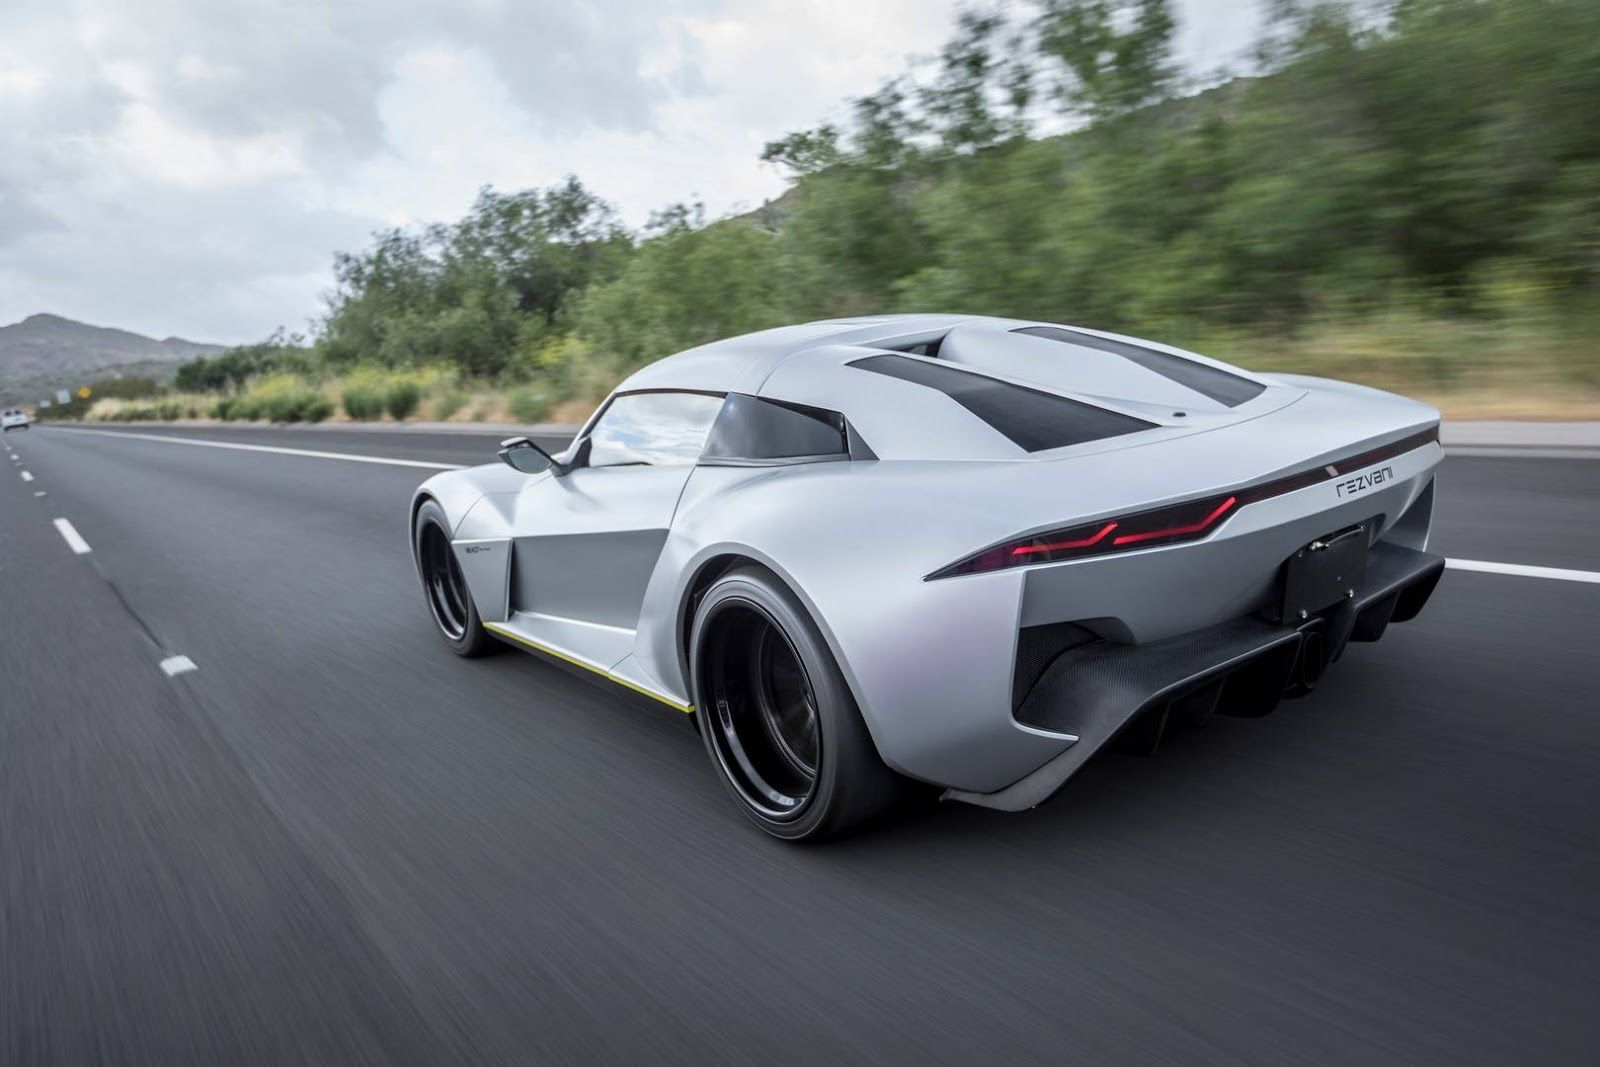 55 8 Million Ferrari 250 200 000 Rezvani Beast Alpha And A Custom Rolls Royce Dawn Super Cars Cars Top Cars